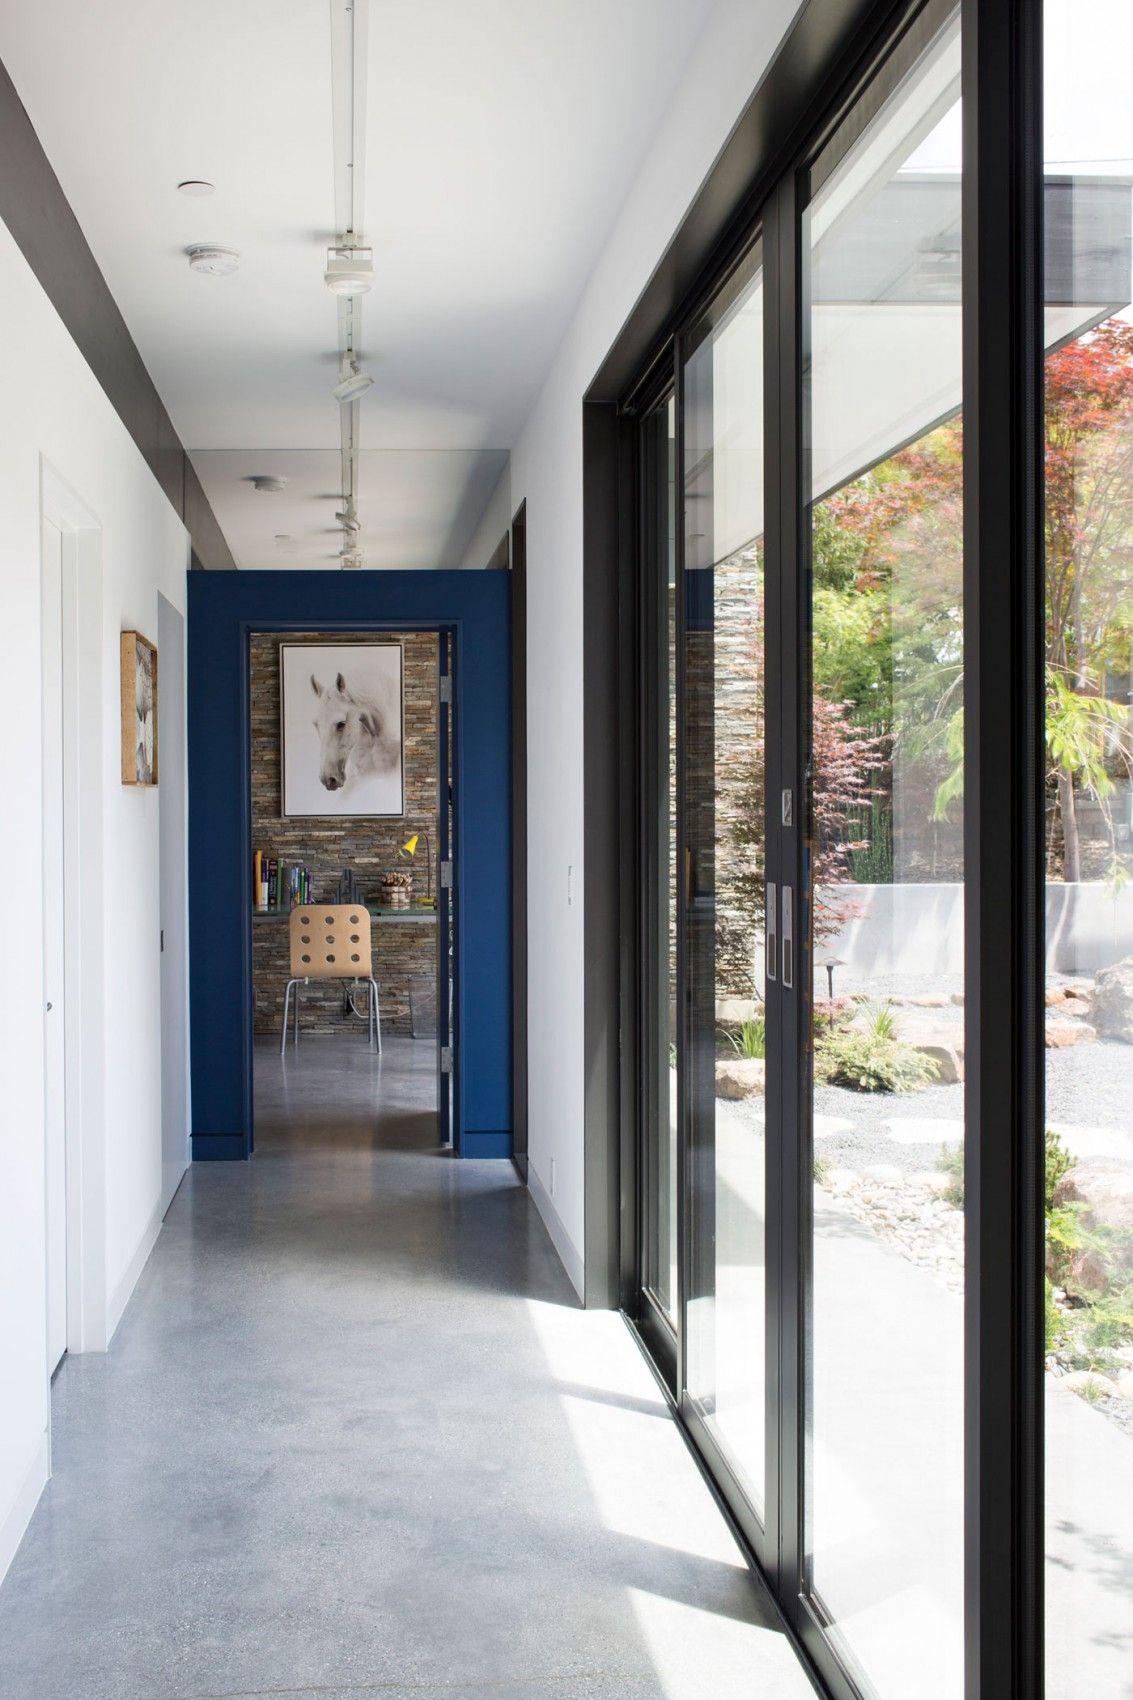 Modern Atrium House by Klopf Architecture (19)